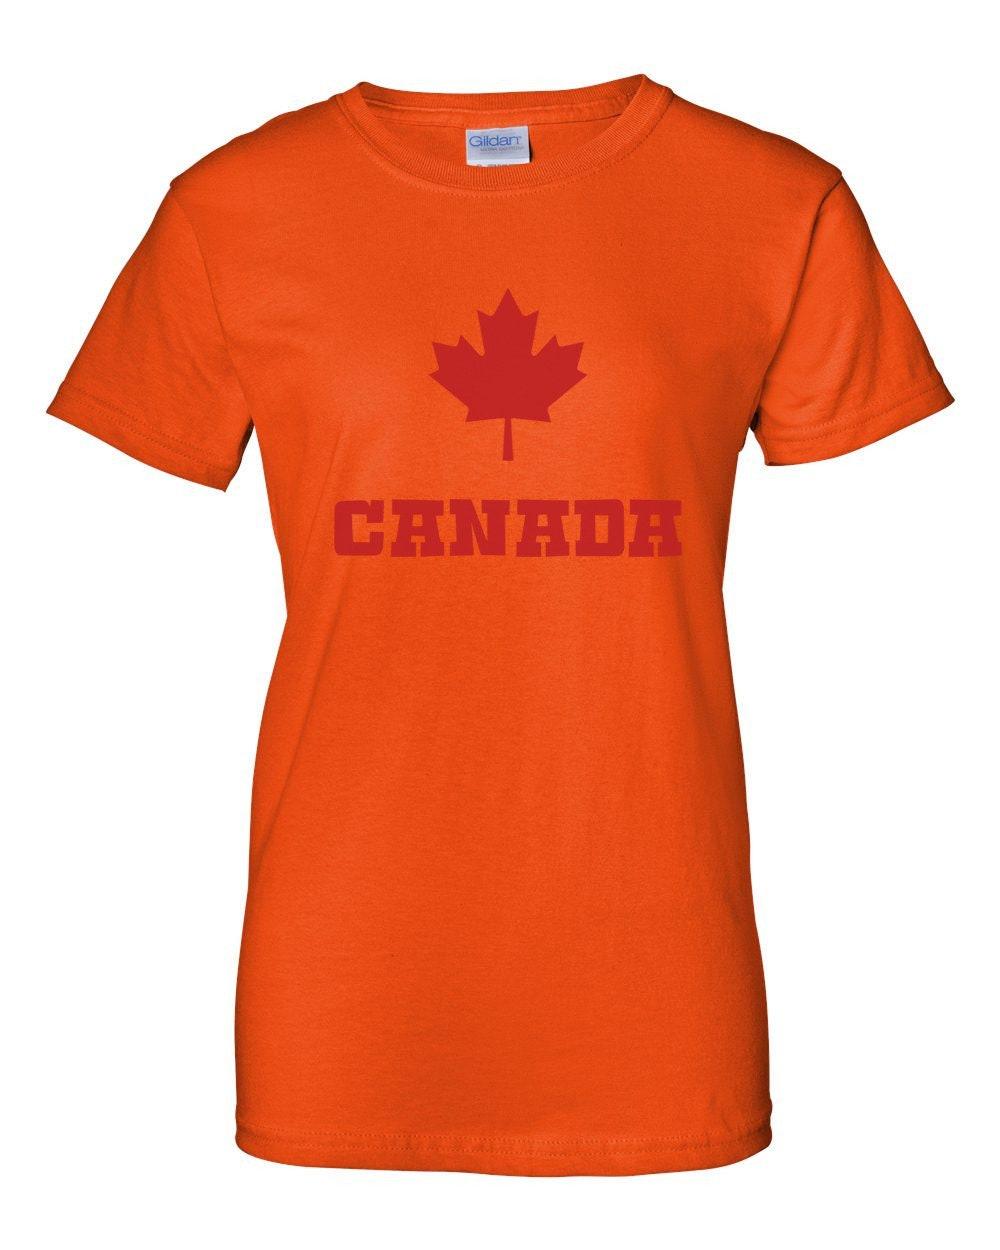 Ladies Canadian Maple Leaf Shirt Canada Pride National Symbol